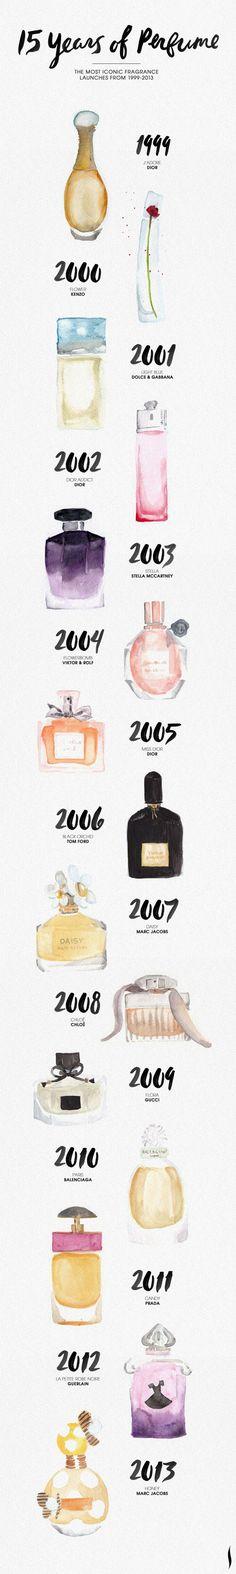 15 years of perfume